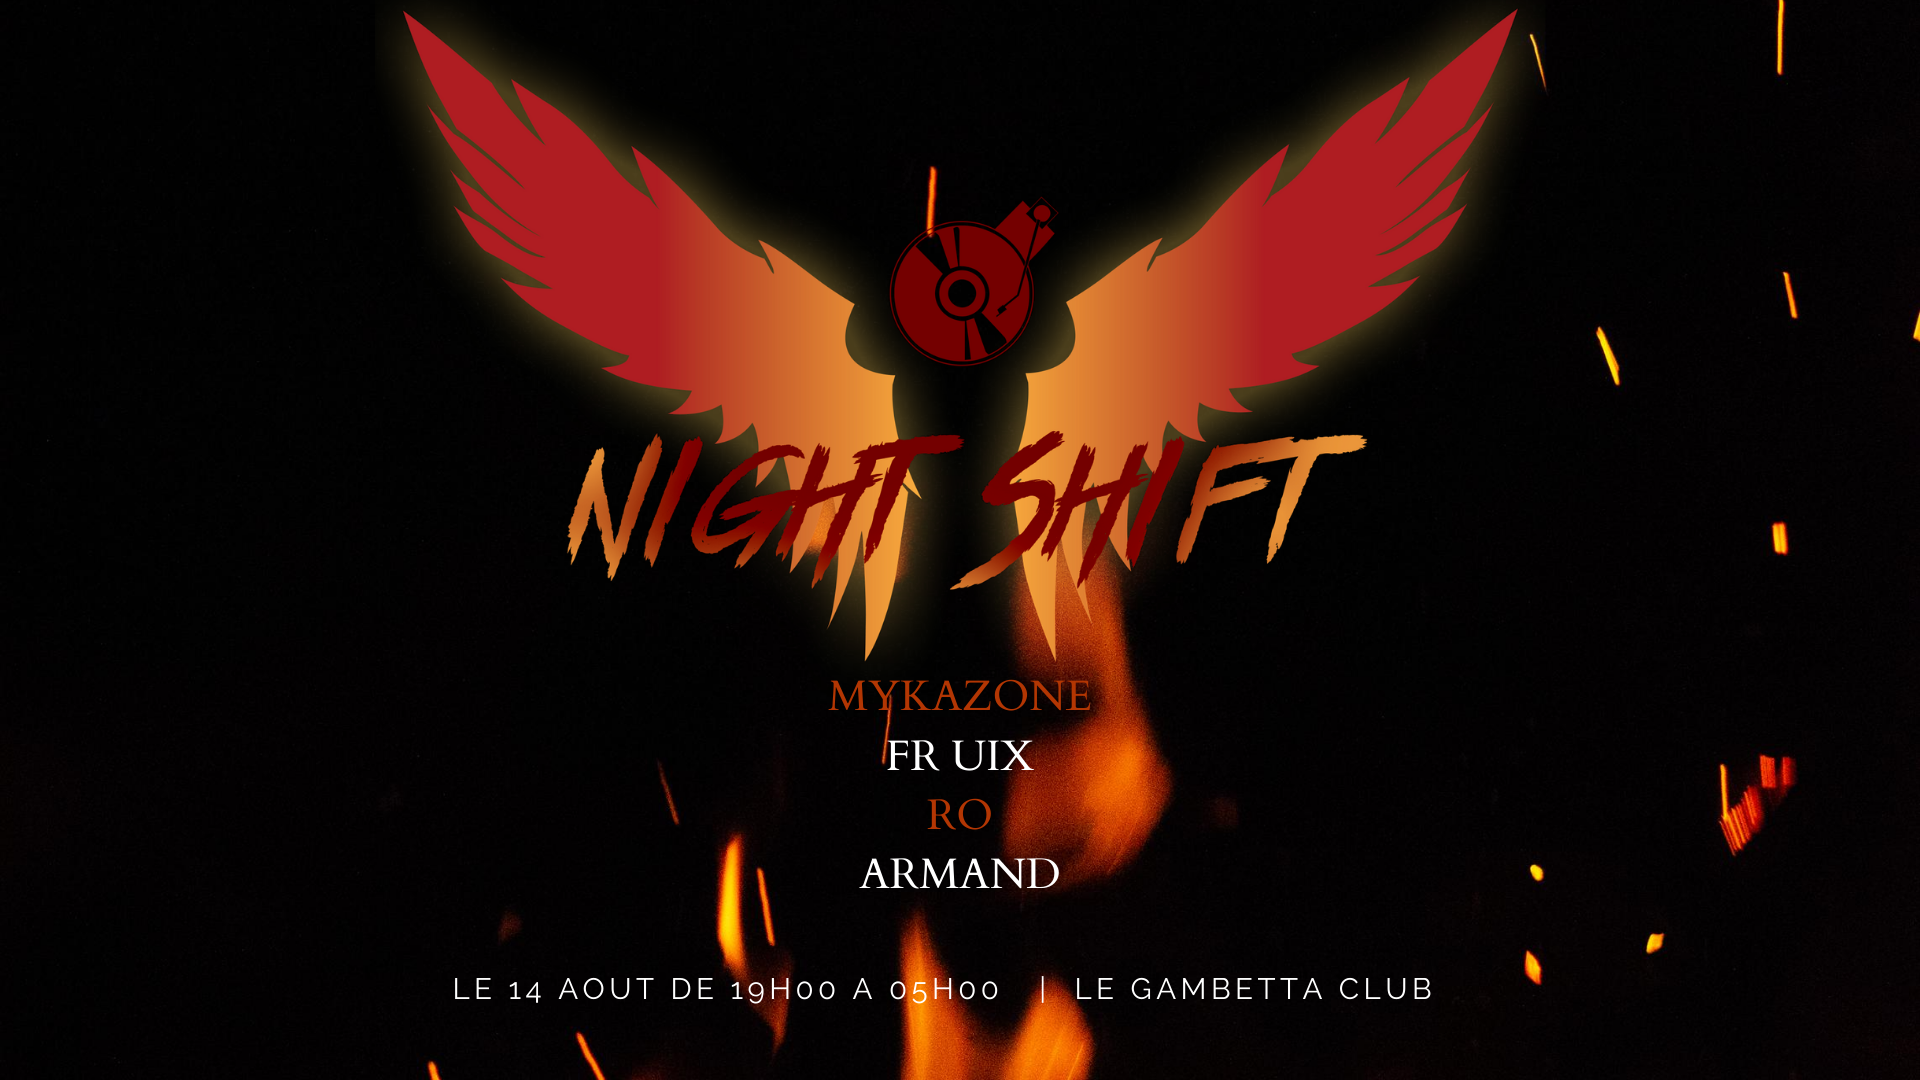 NIGHTSHIFT #1 - Progressive, Melodic House & Techno